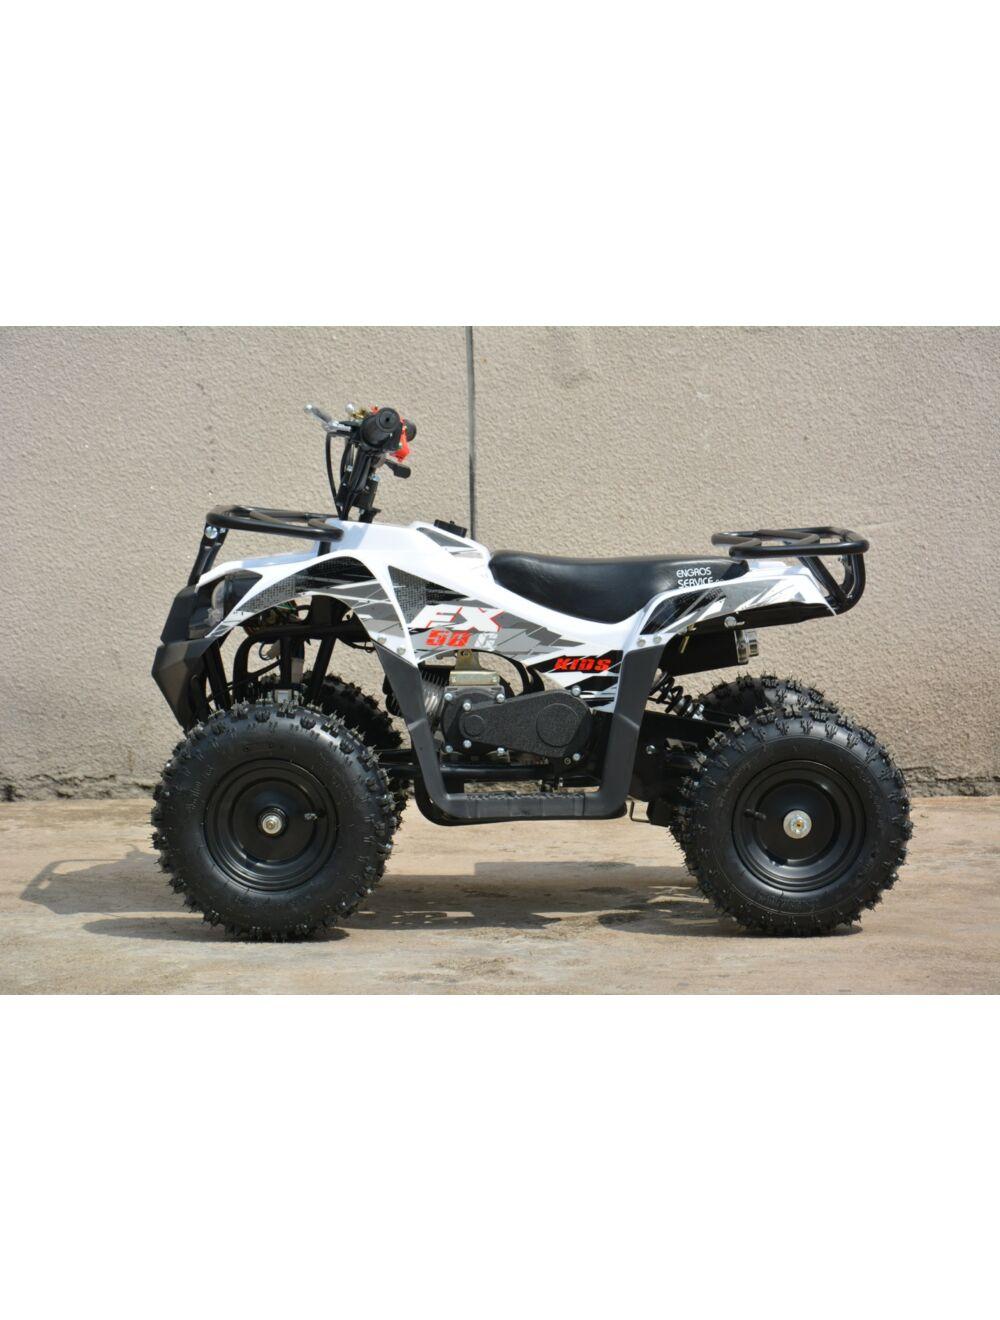 FARMER MINI ATV 49CC FOR BARN HVIT